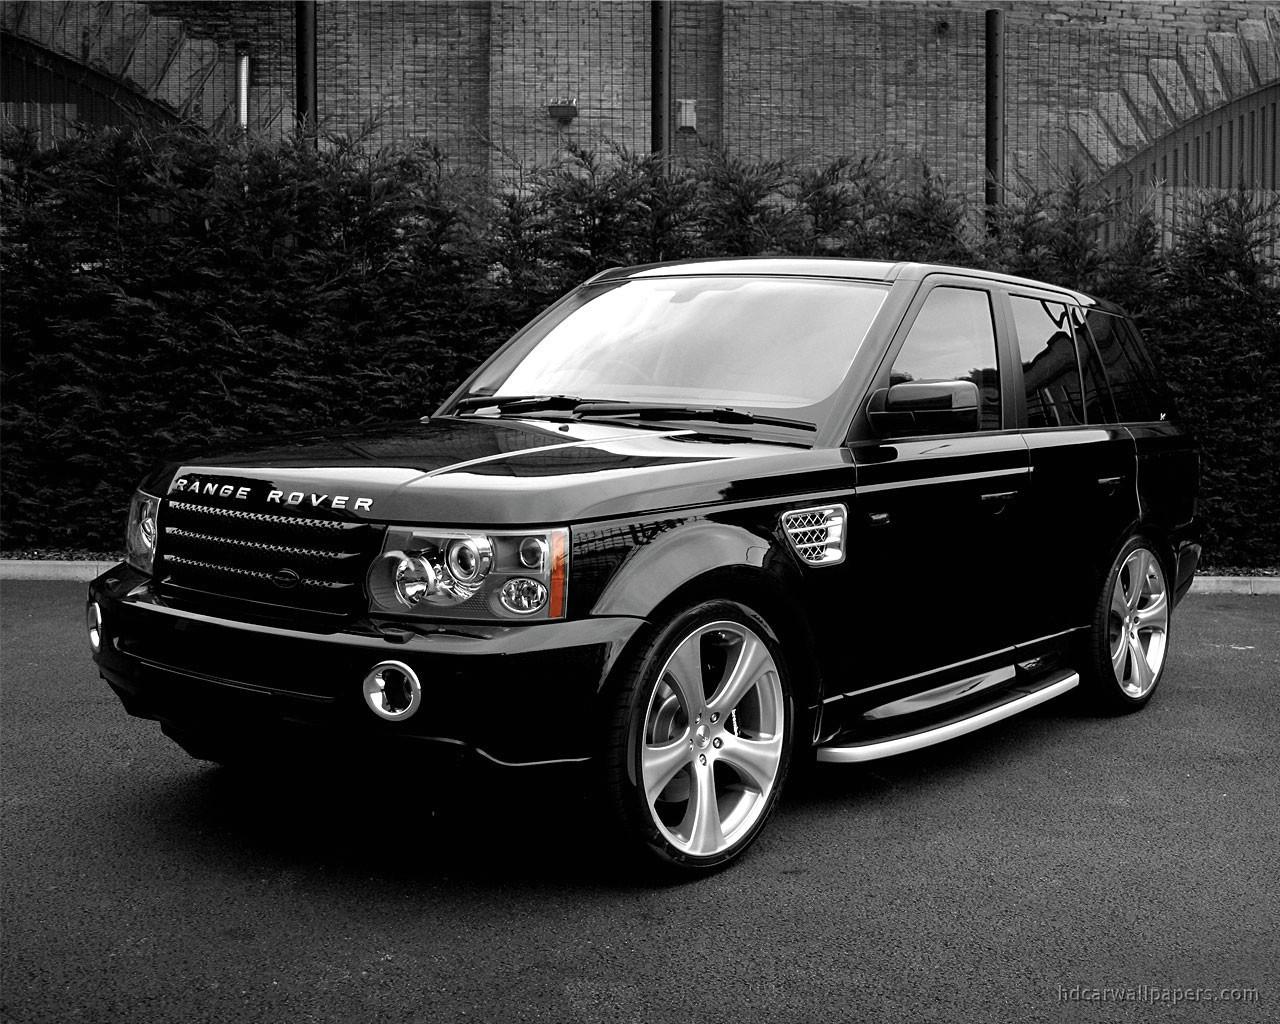 Range Rover Sport Black Wallpaper: Black Sexy Land Rover Wallpaper